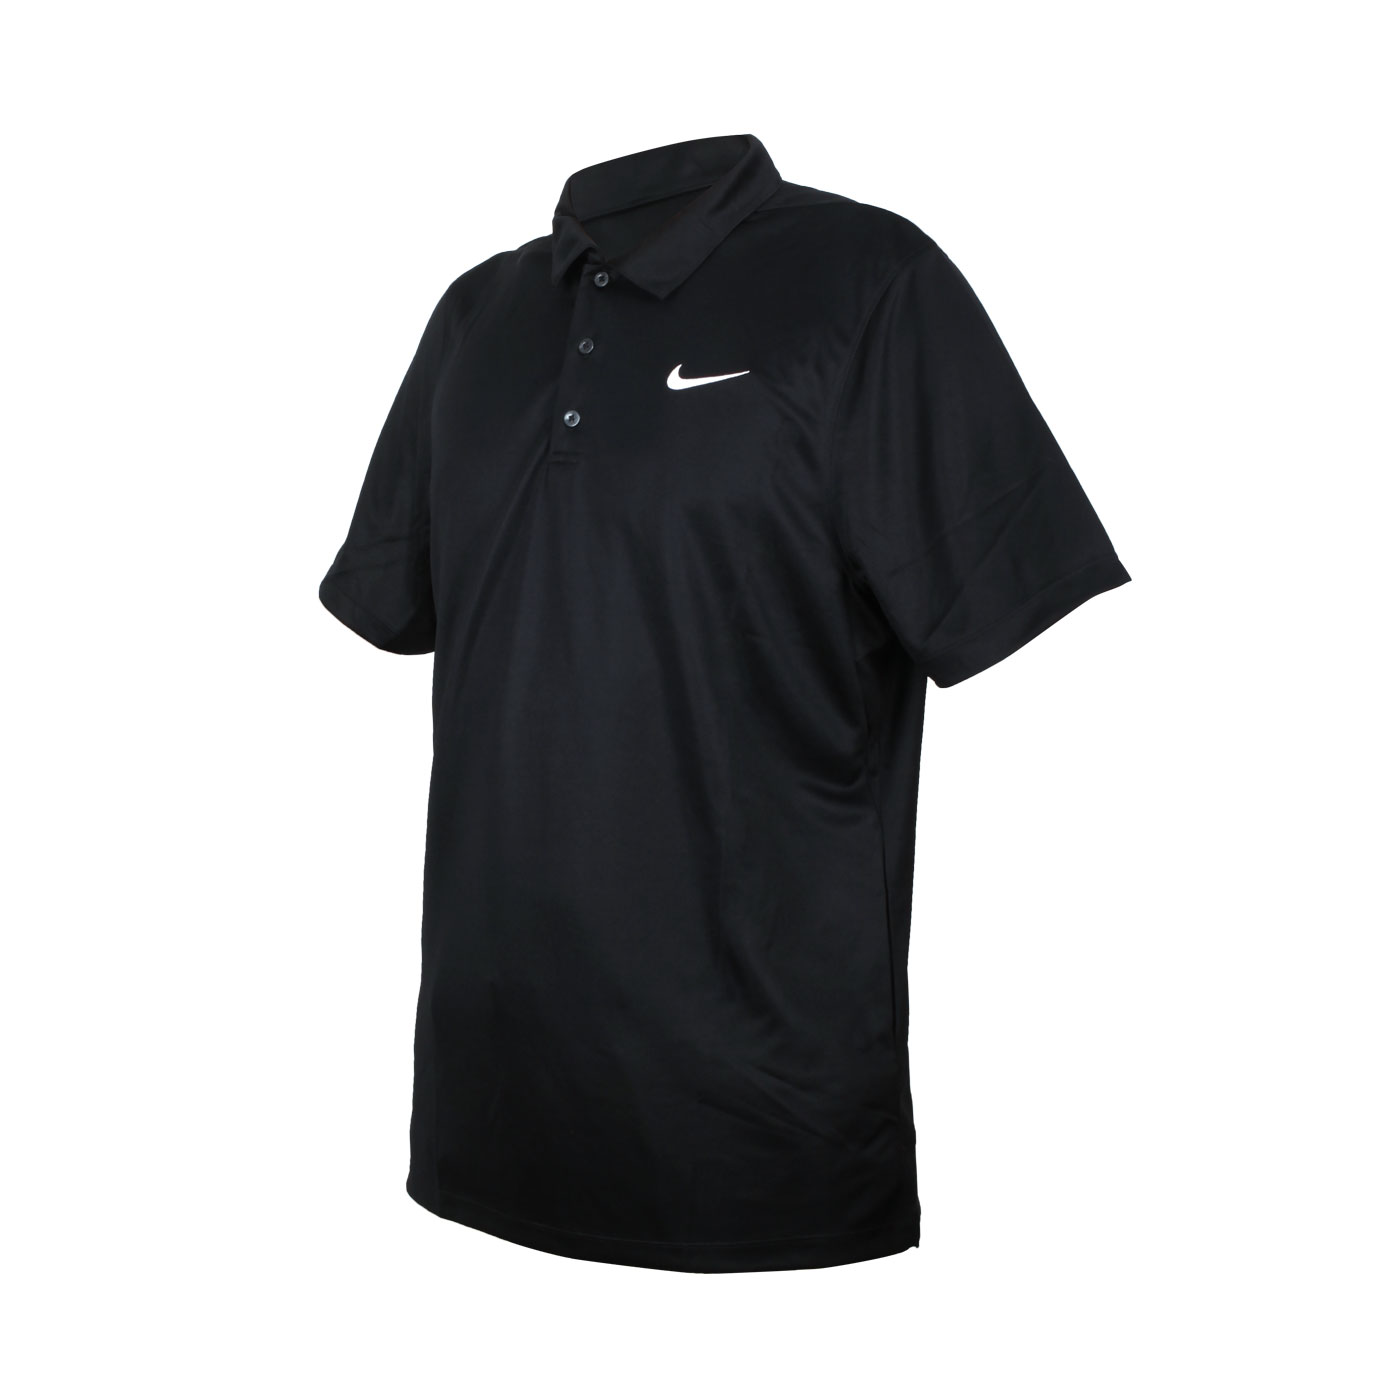 NIKE 男款短袖POLO衫 APS080-010